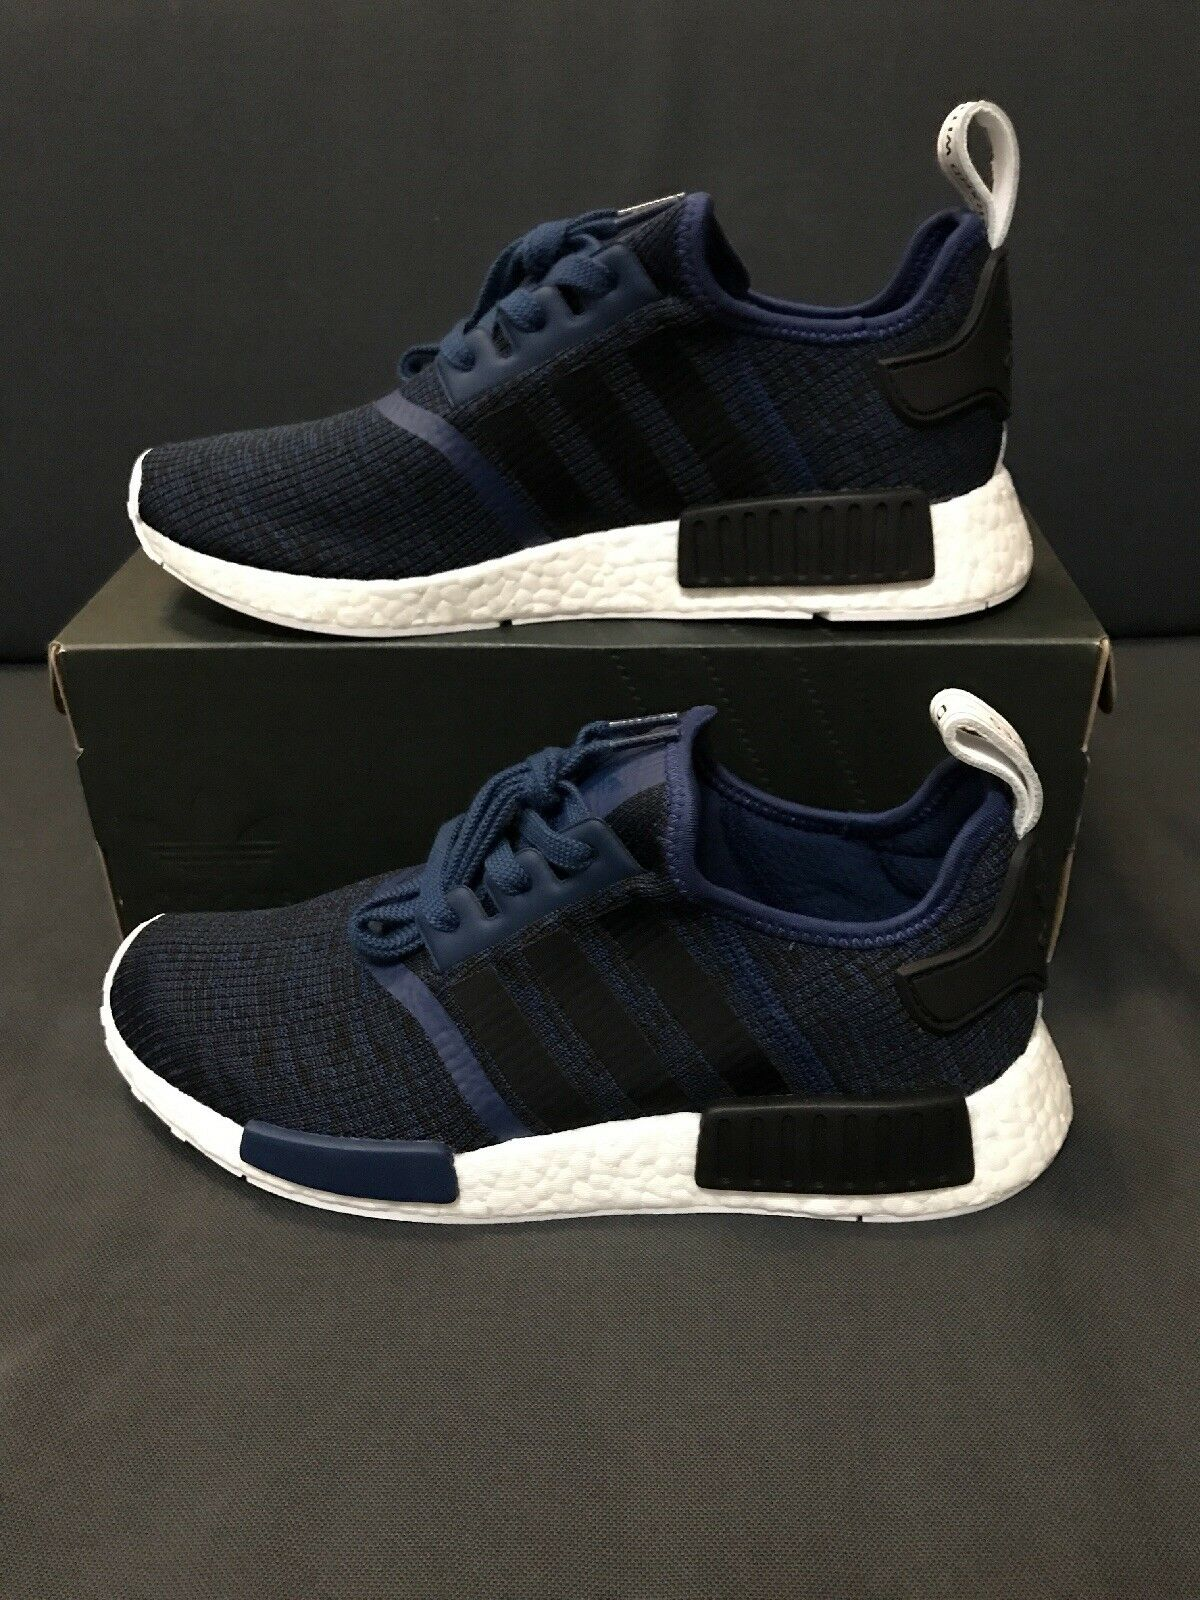 Adidas NMD R1  Mistero blu  presa di fabbrica